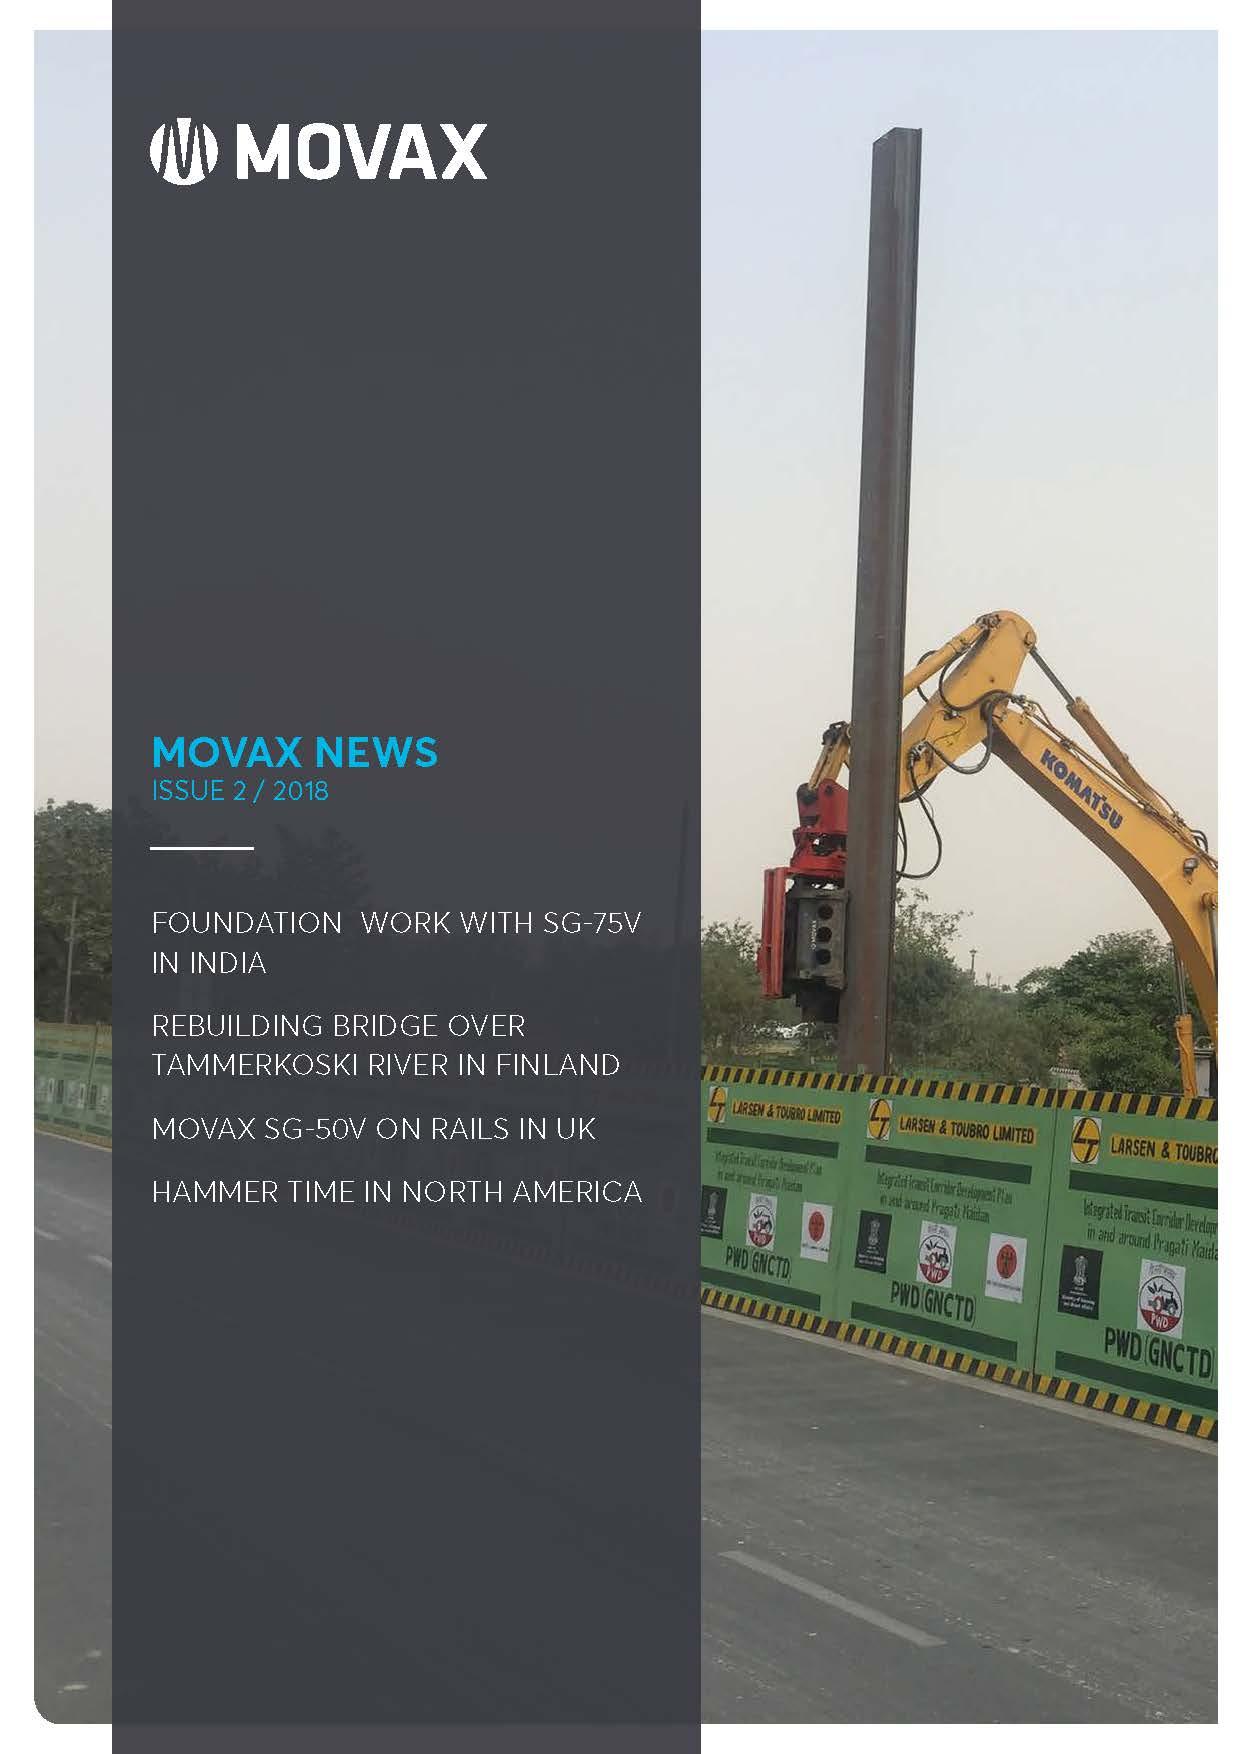 Movax News 02/2018